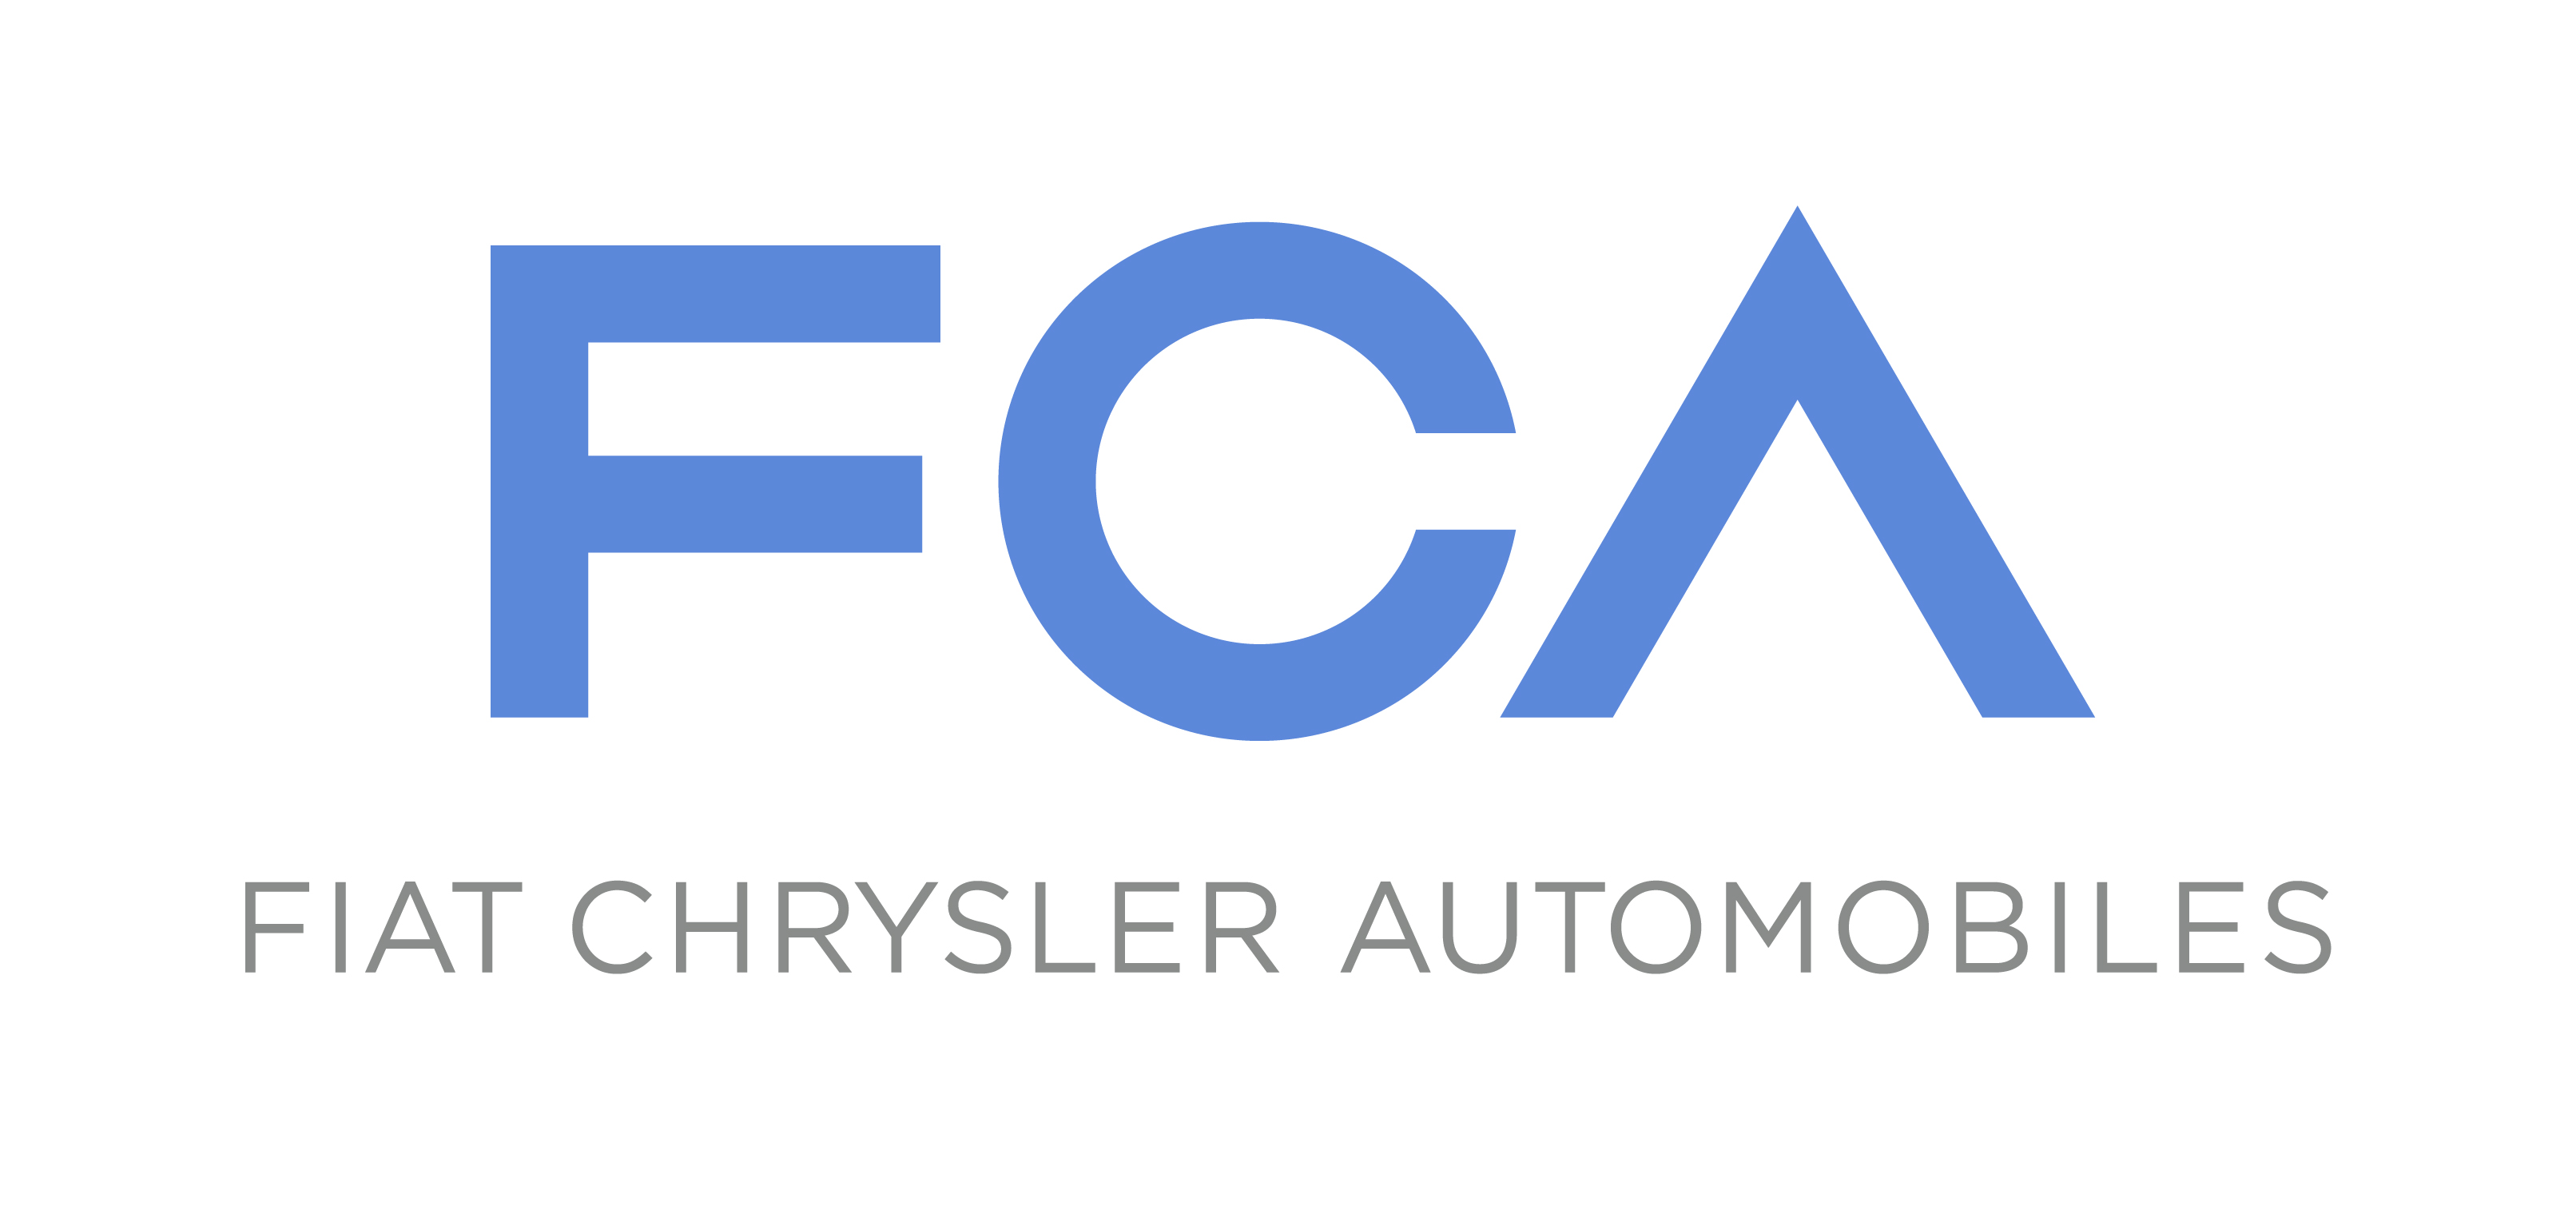 Nasce Fiat Chrysler Automobiles